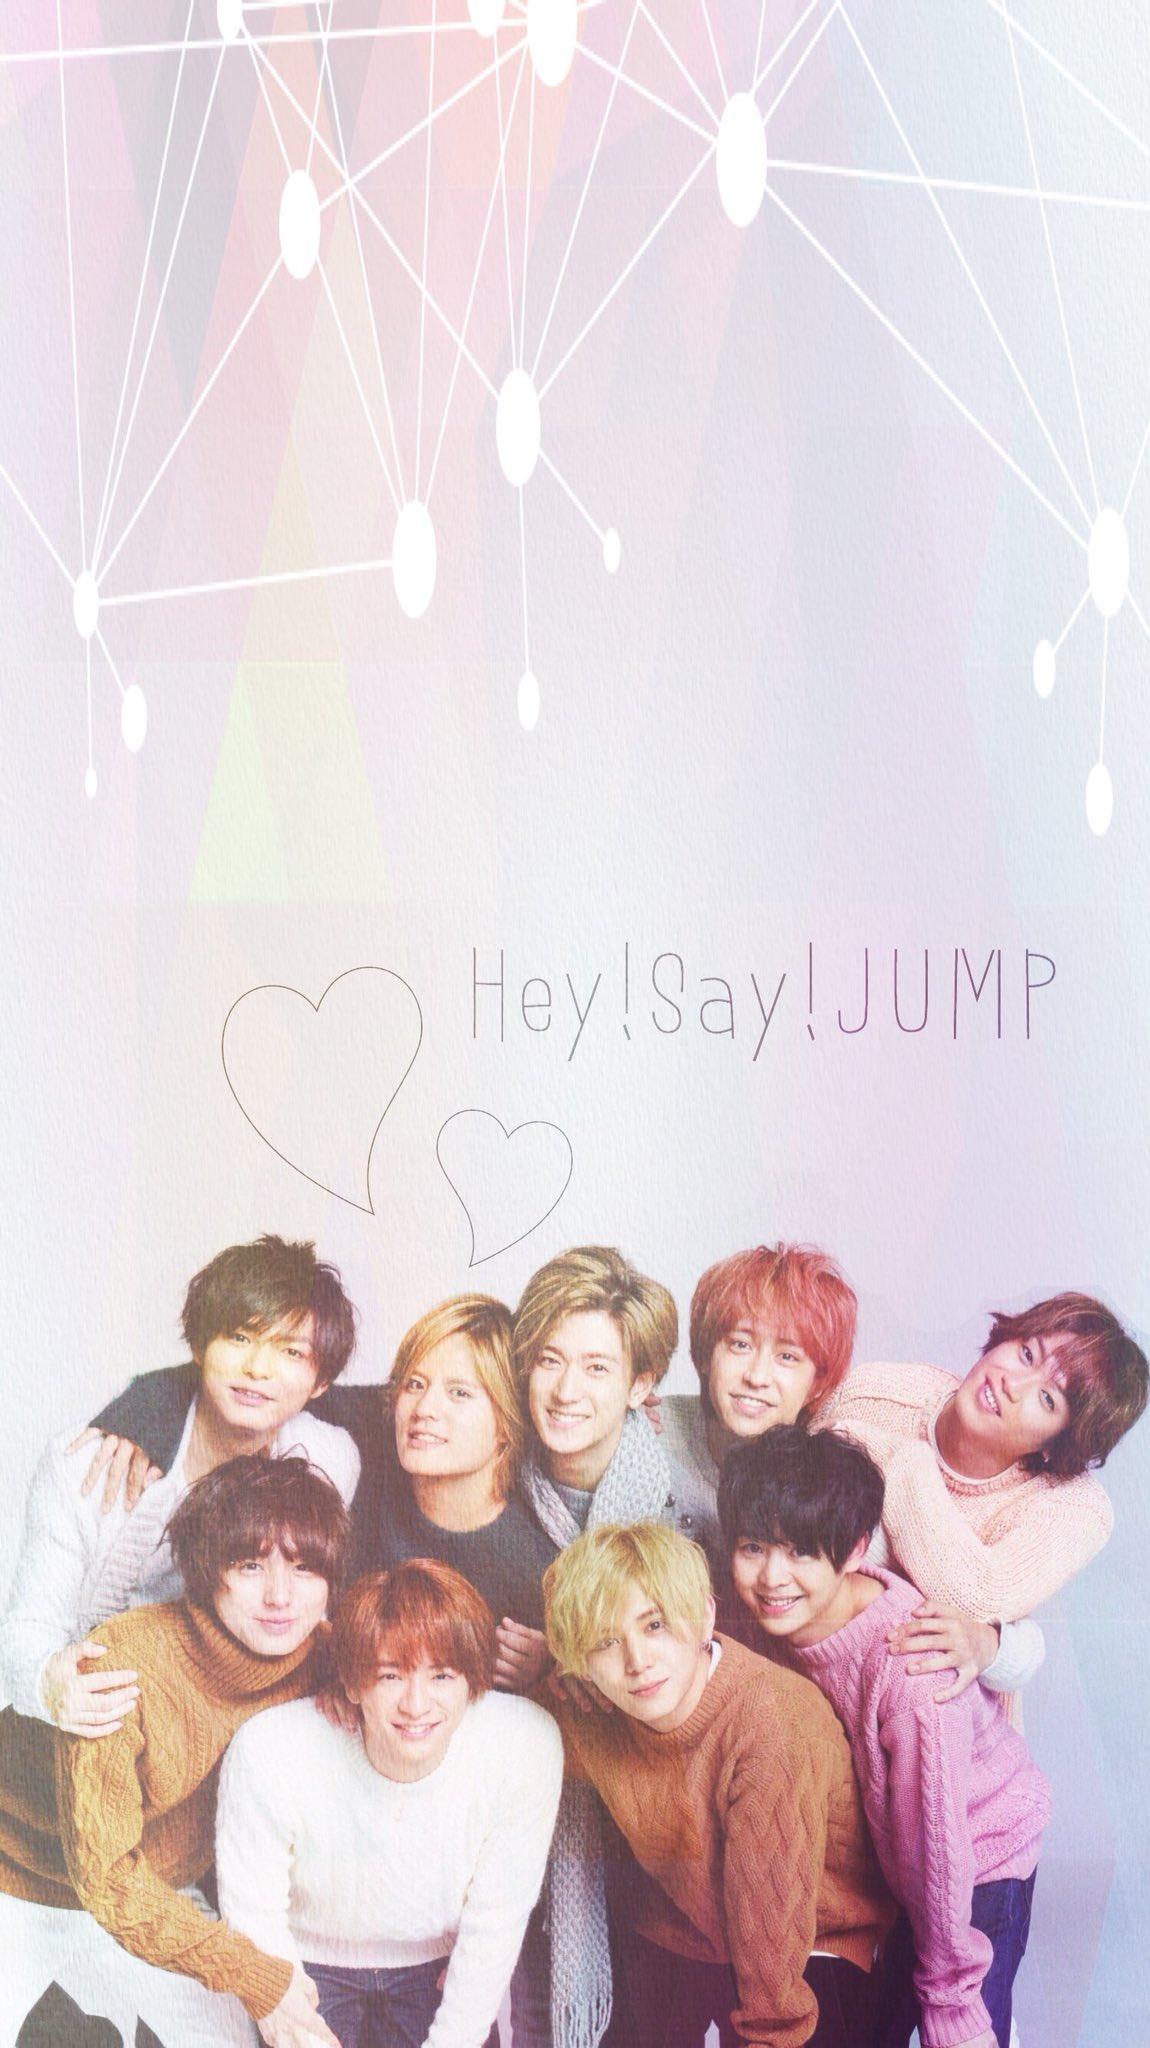 Hey Say Jump 壁紙 シンプル Hey Say Jump 壁紙 シンプル 最高のディズニー画像